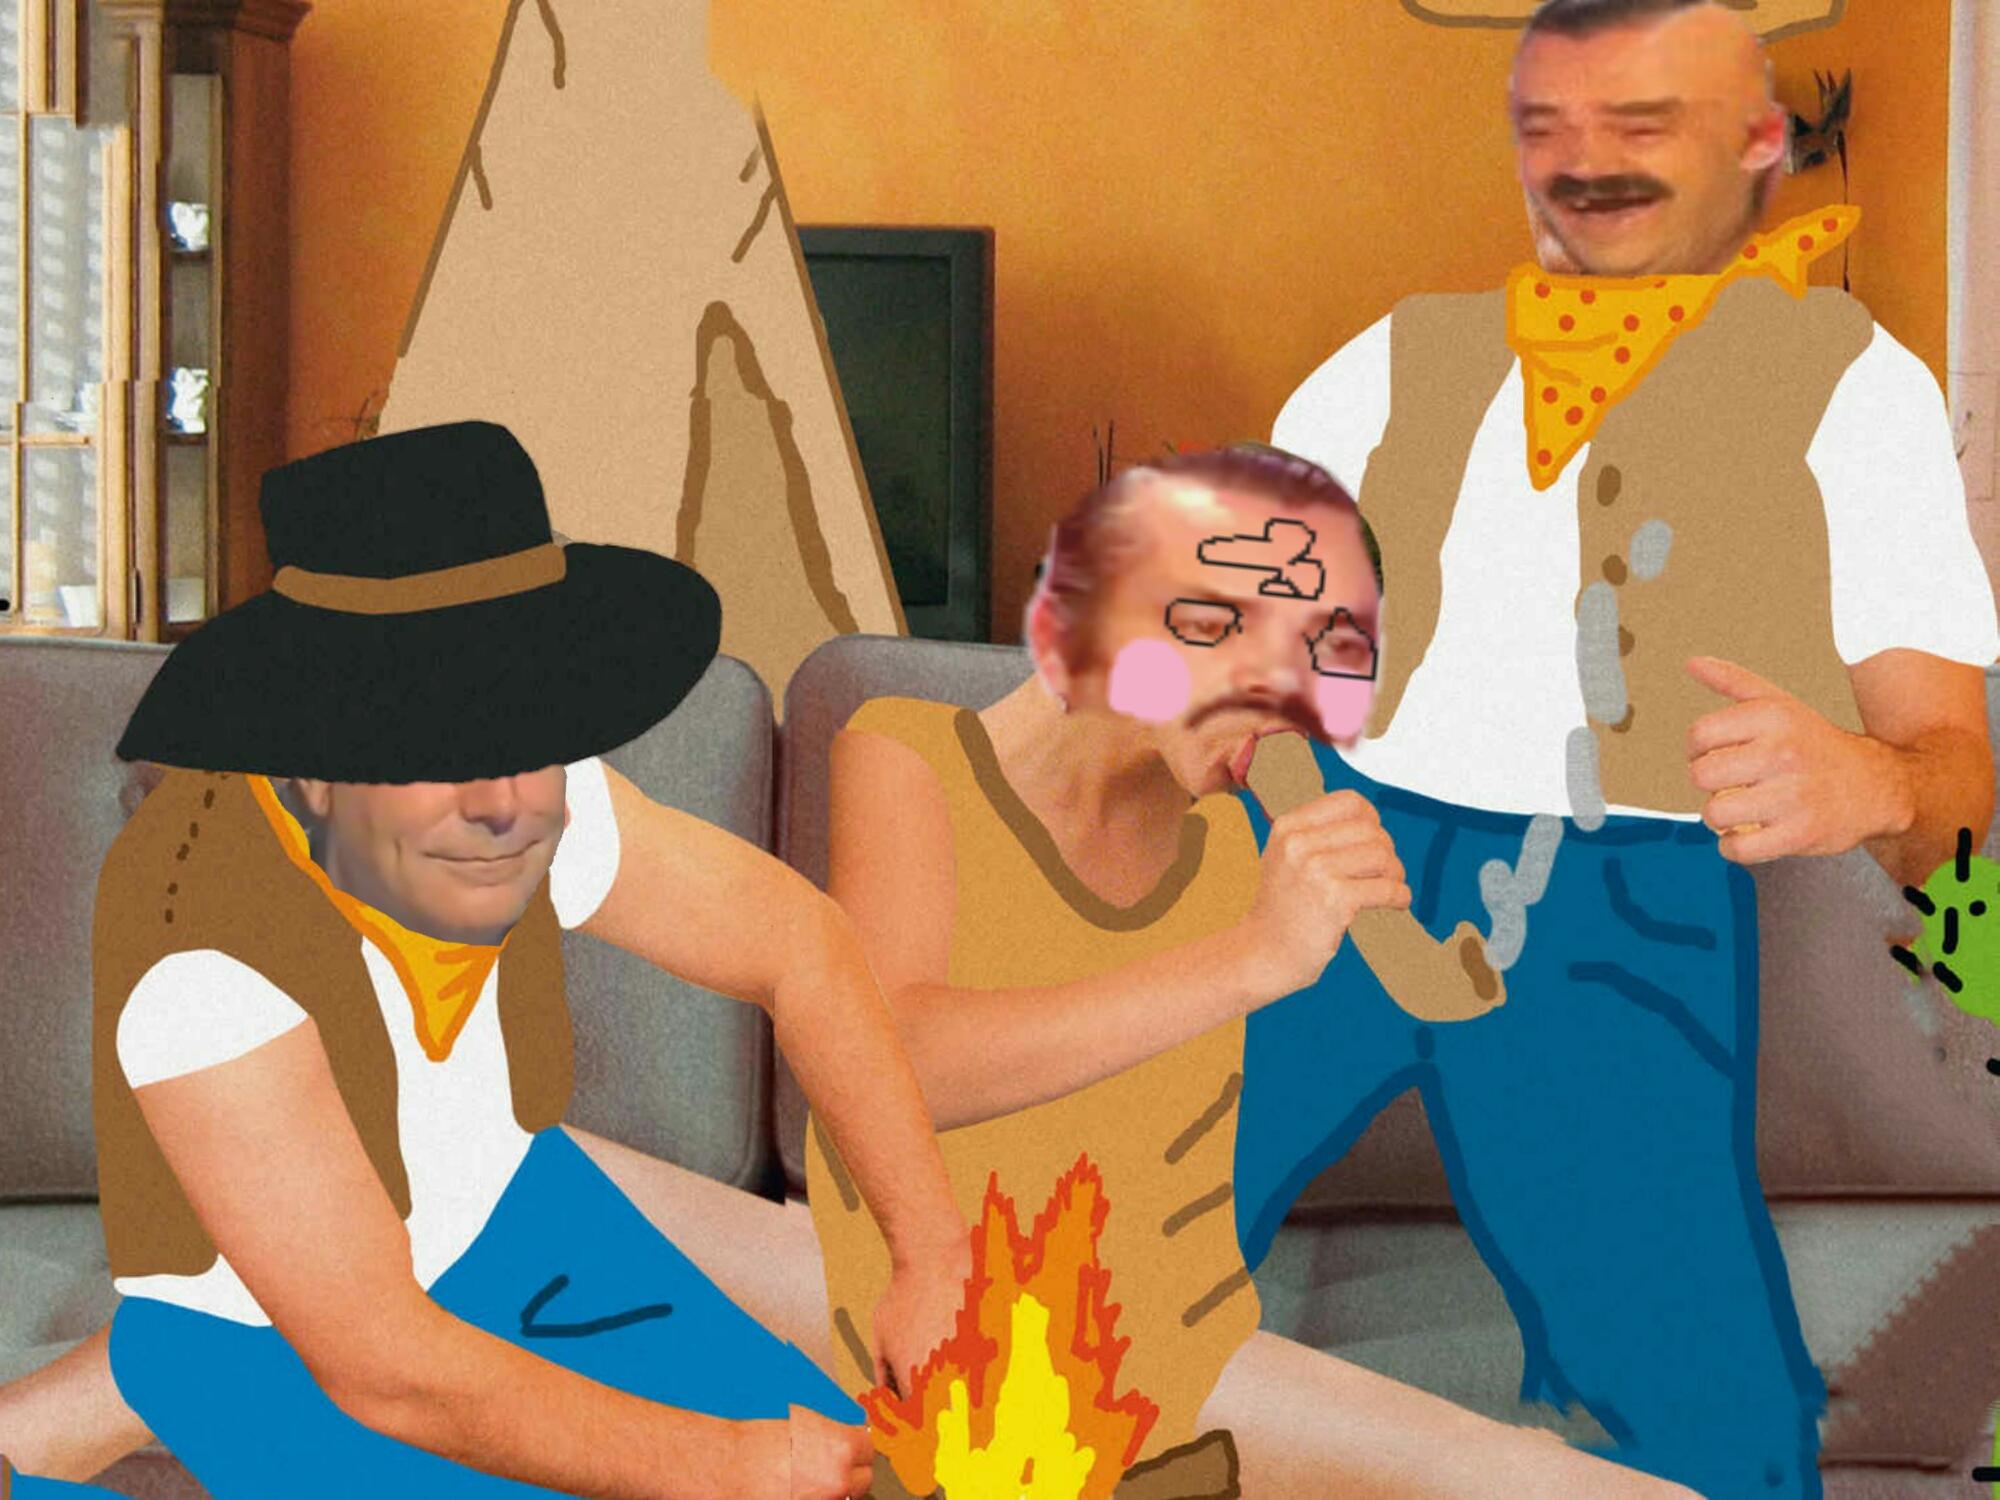 Sticker risitas jeu fume feu 3 gars homme sex